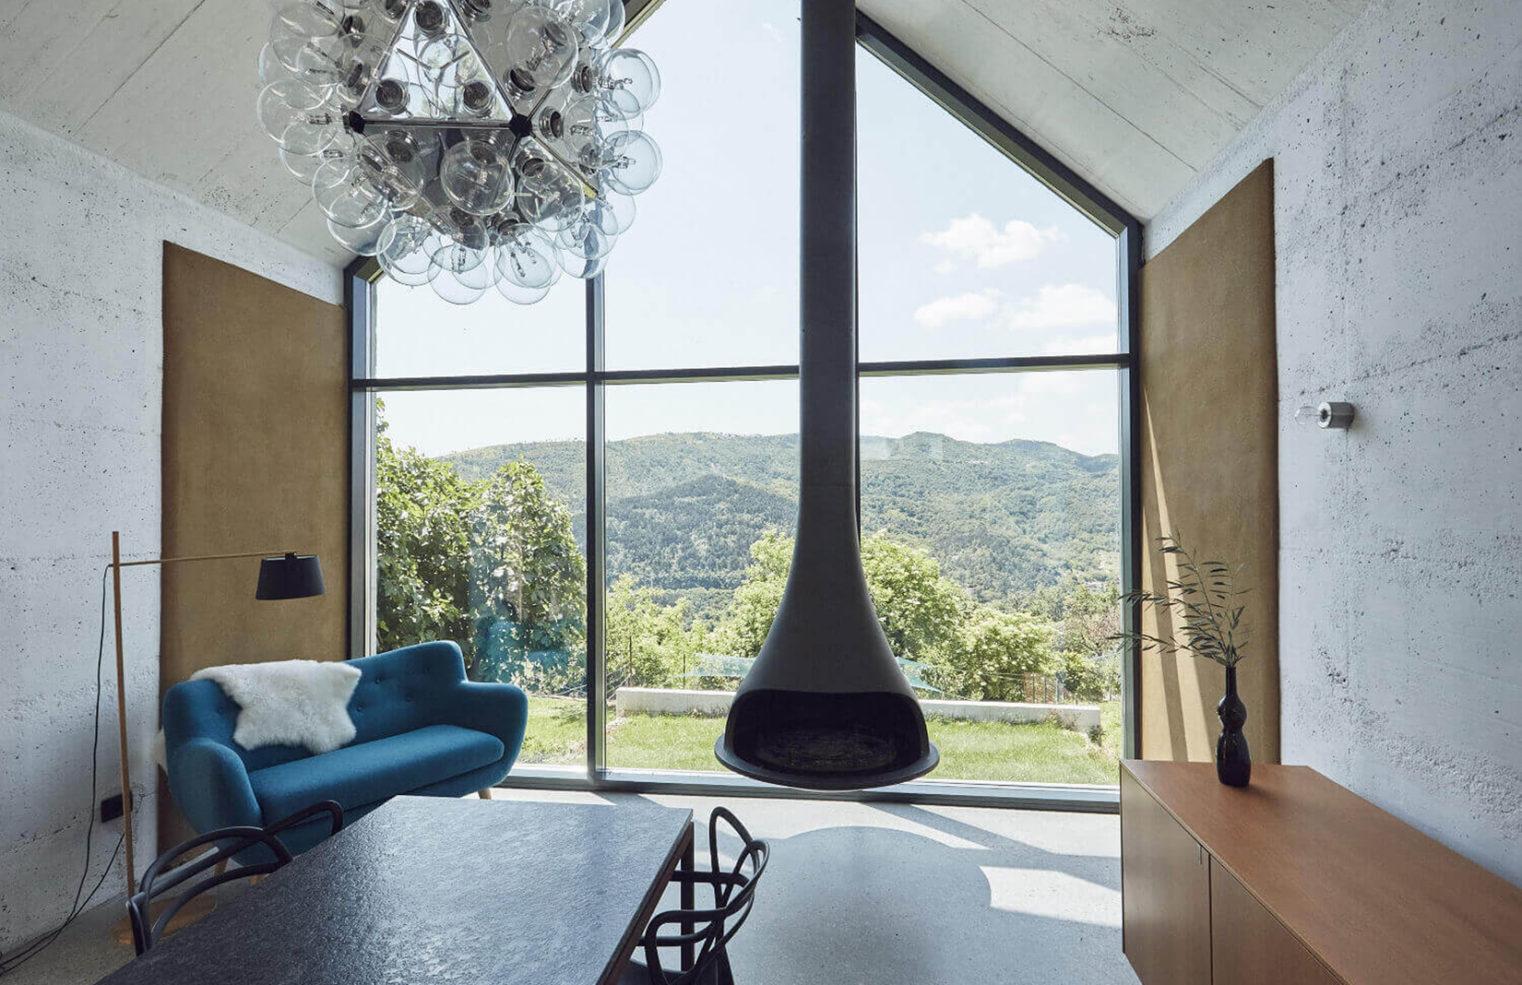 Holiday rental: Villa Mravljevi in Slovenia